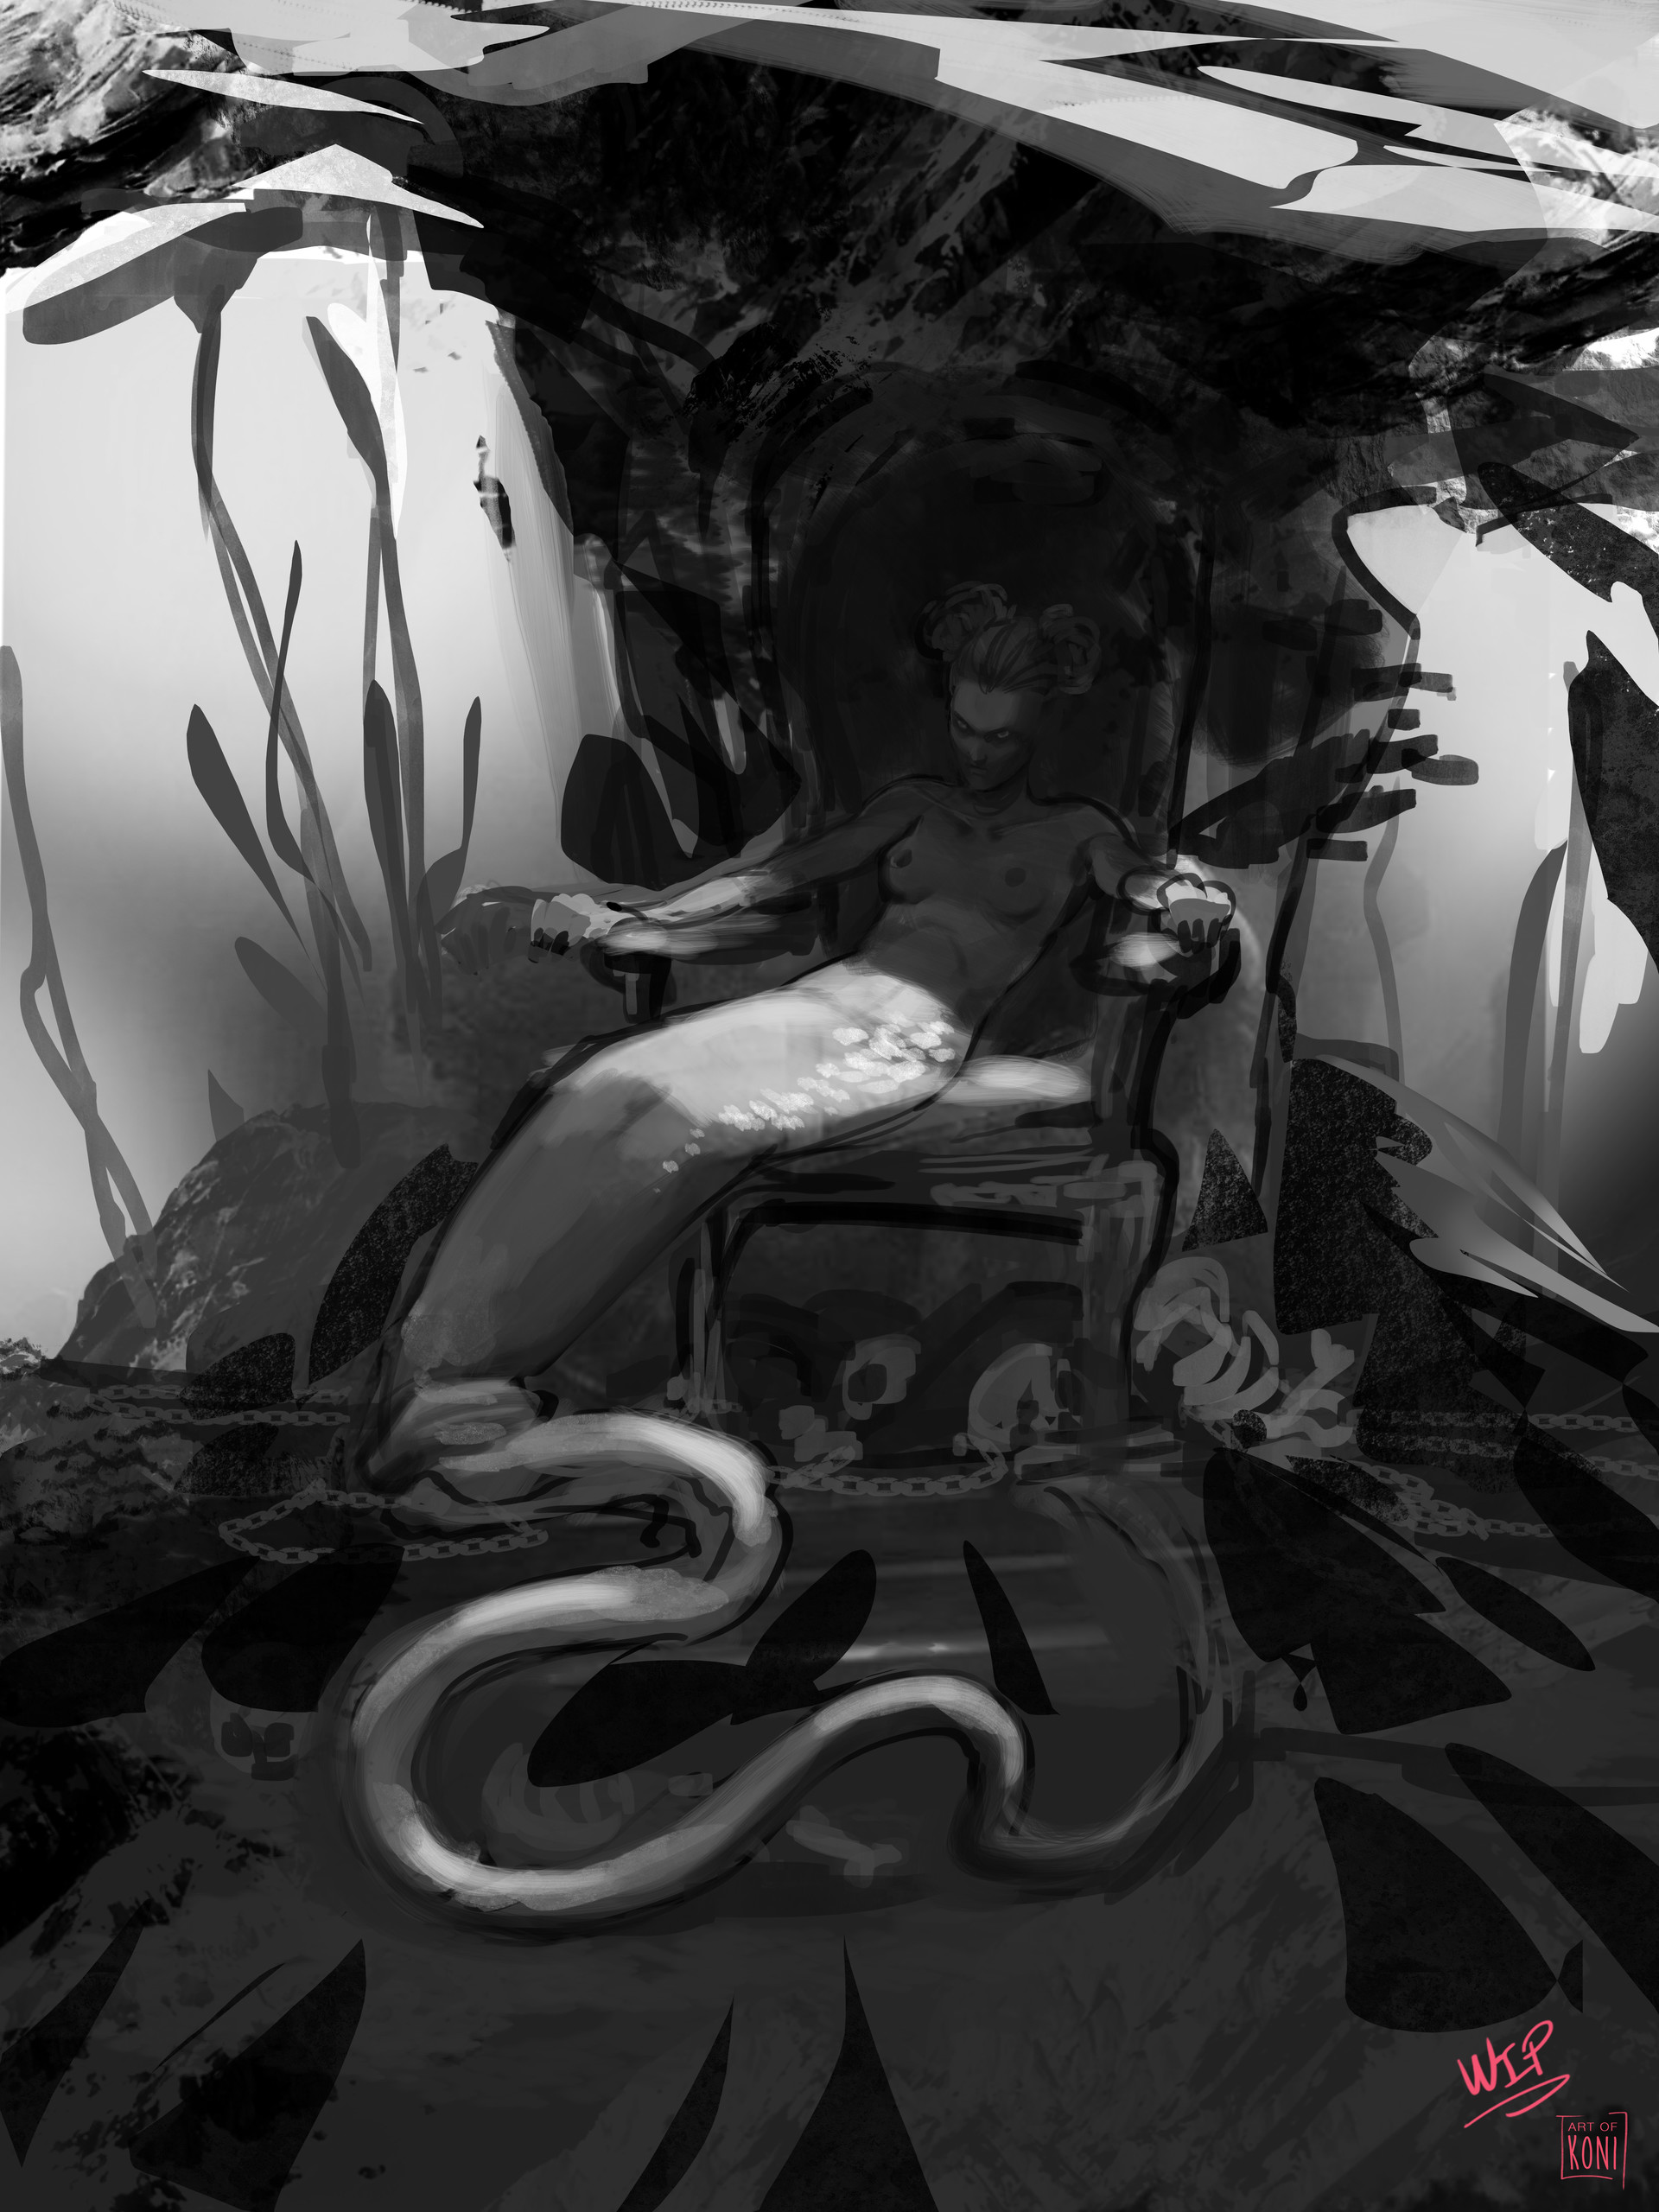 Koni amandine girard amandine girard koni berta sirena the demon of the sea wip 01